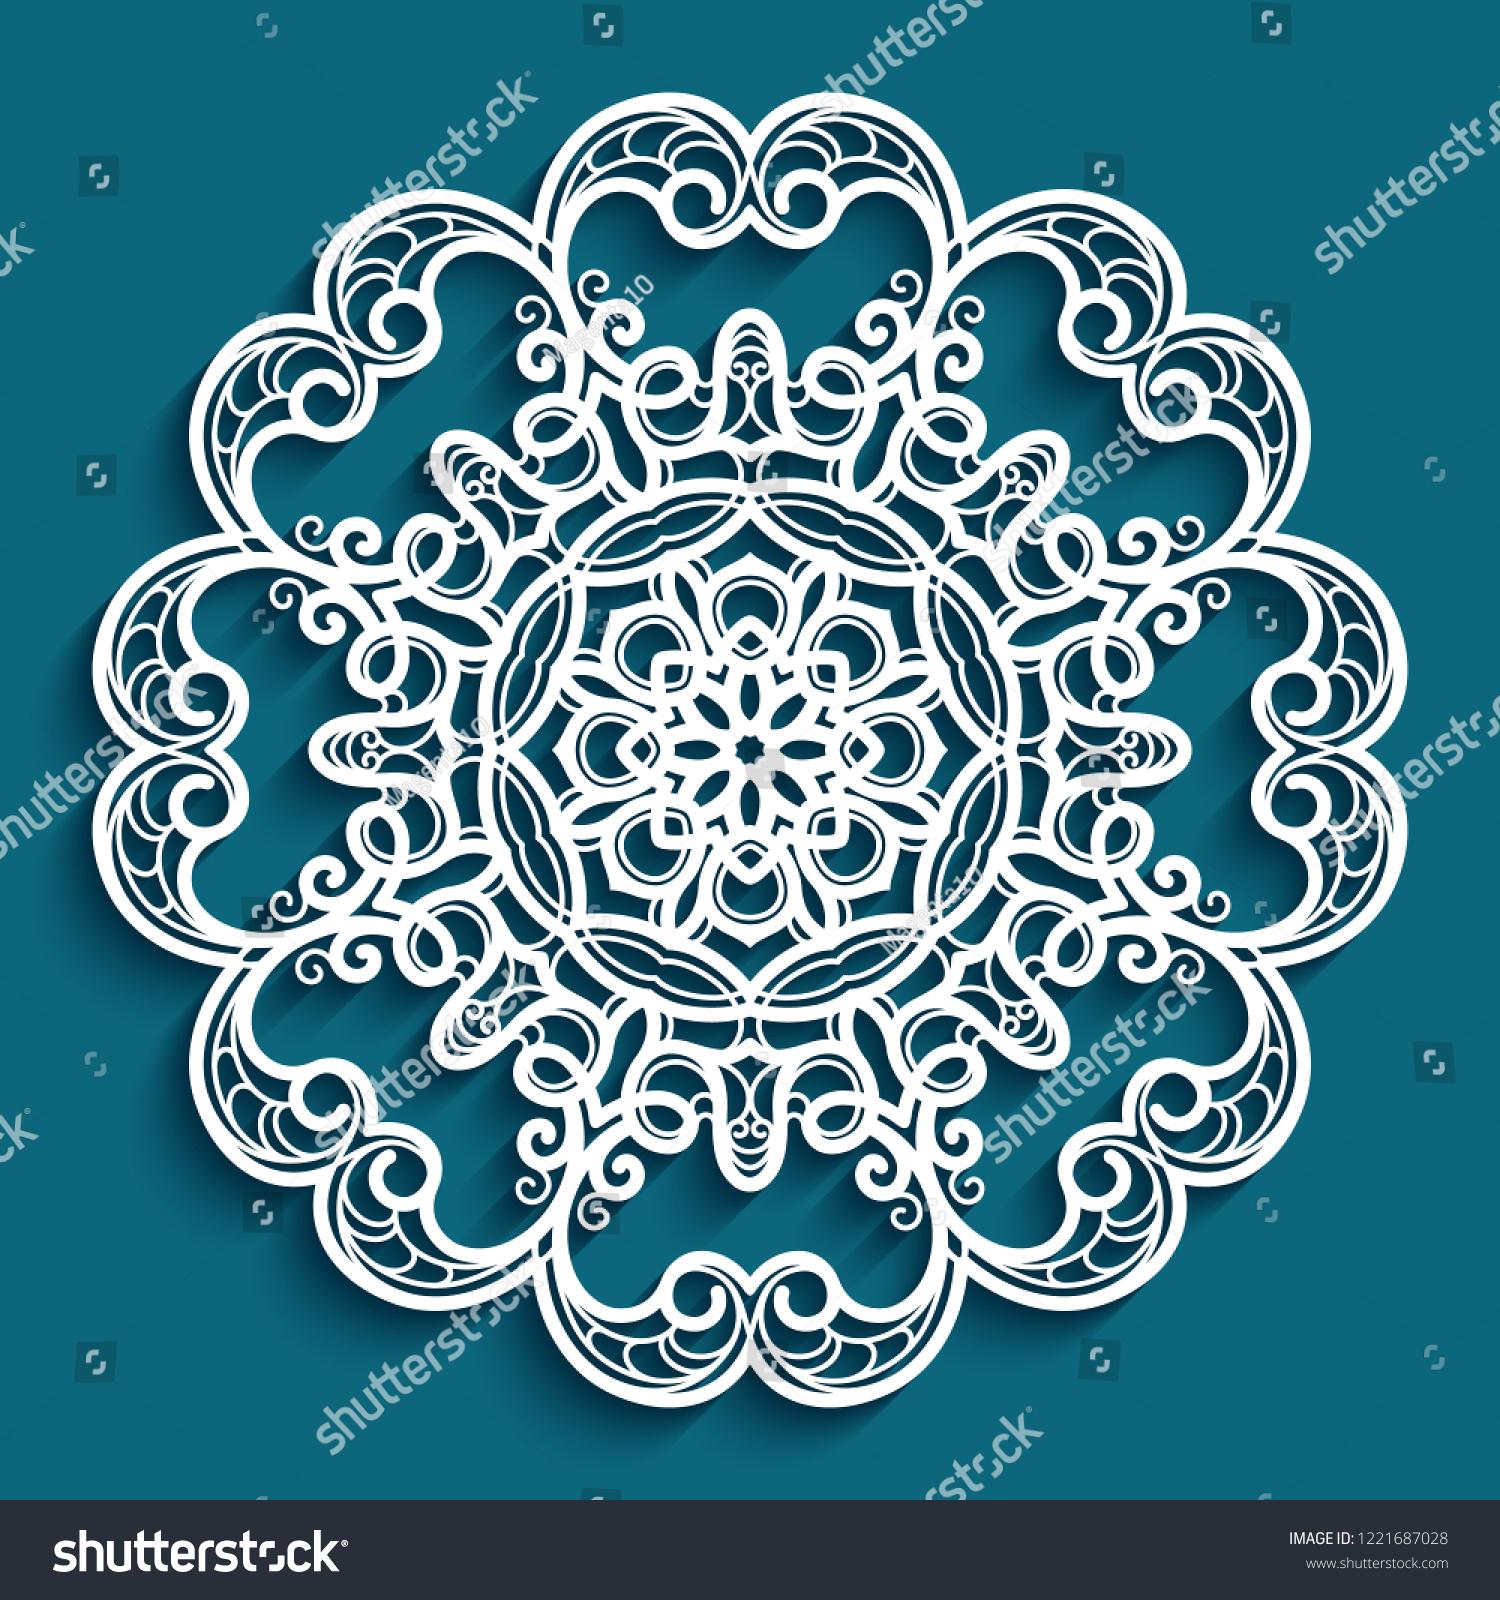 Round Lace Doily Crochet Ornament Decorative Stock Vector Royalty